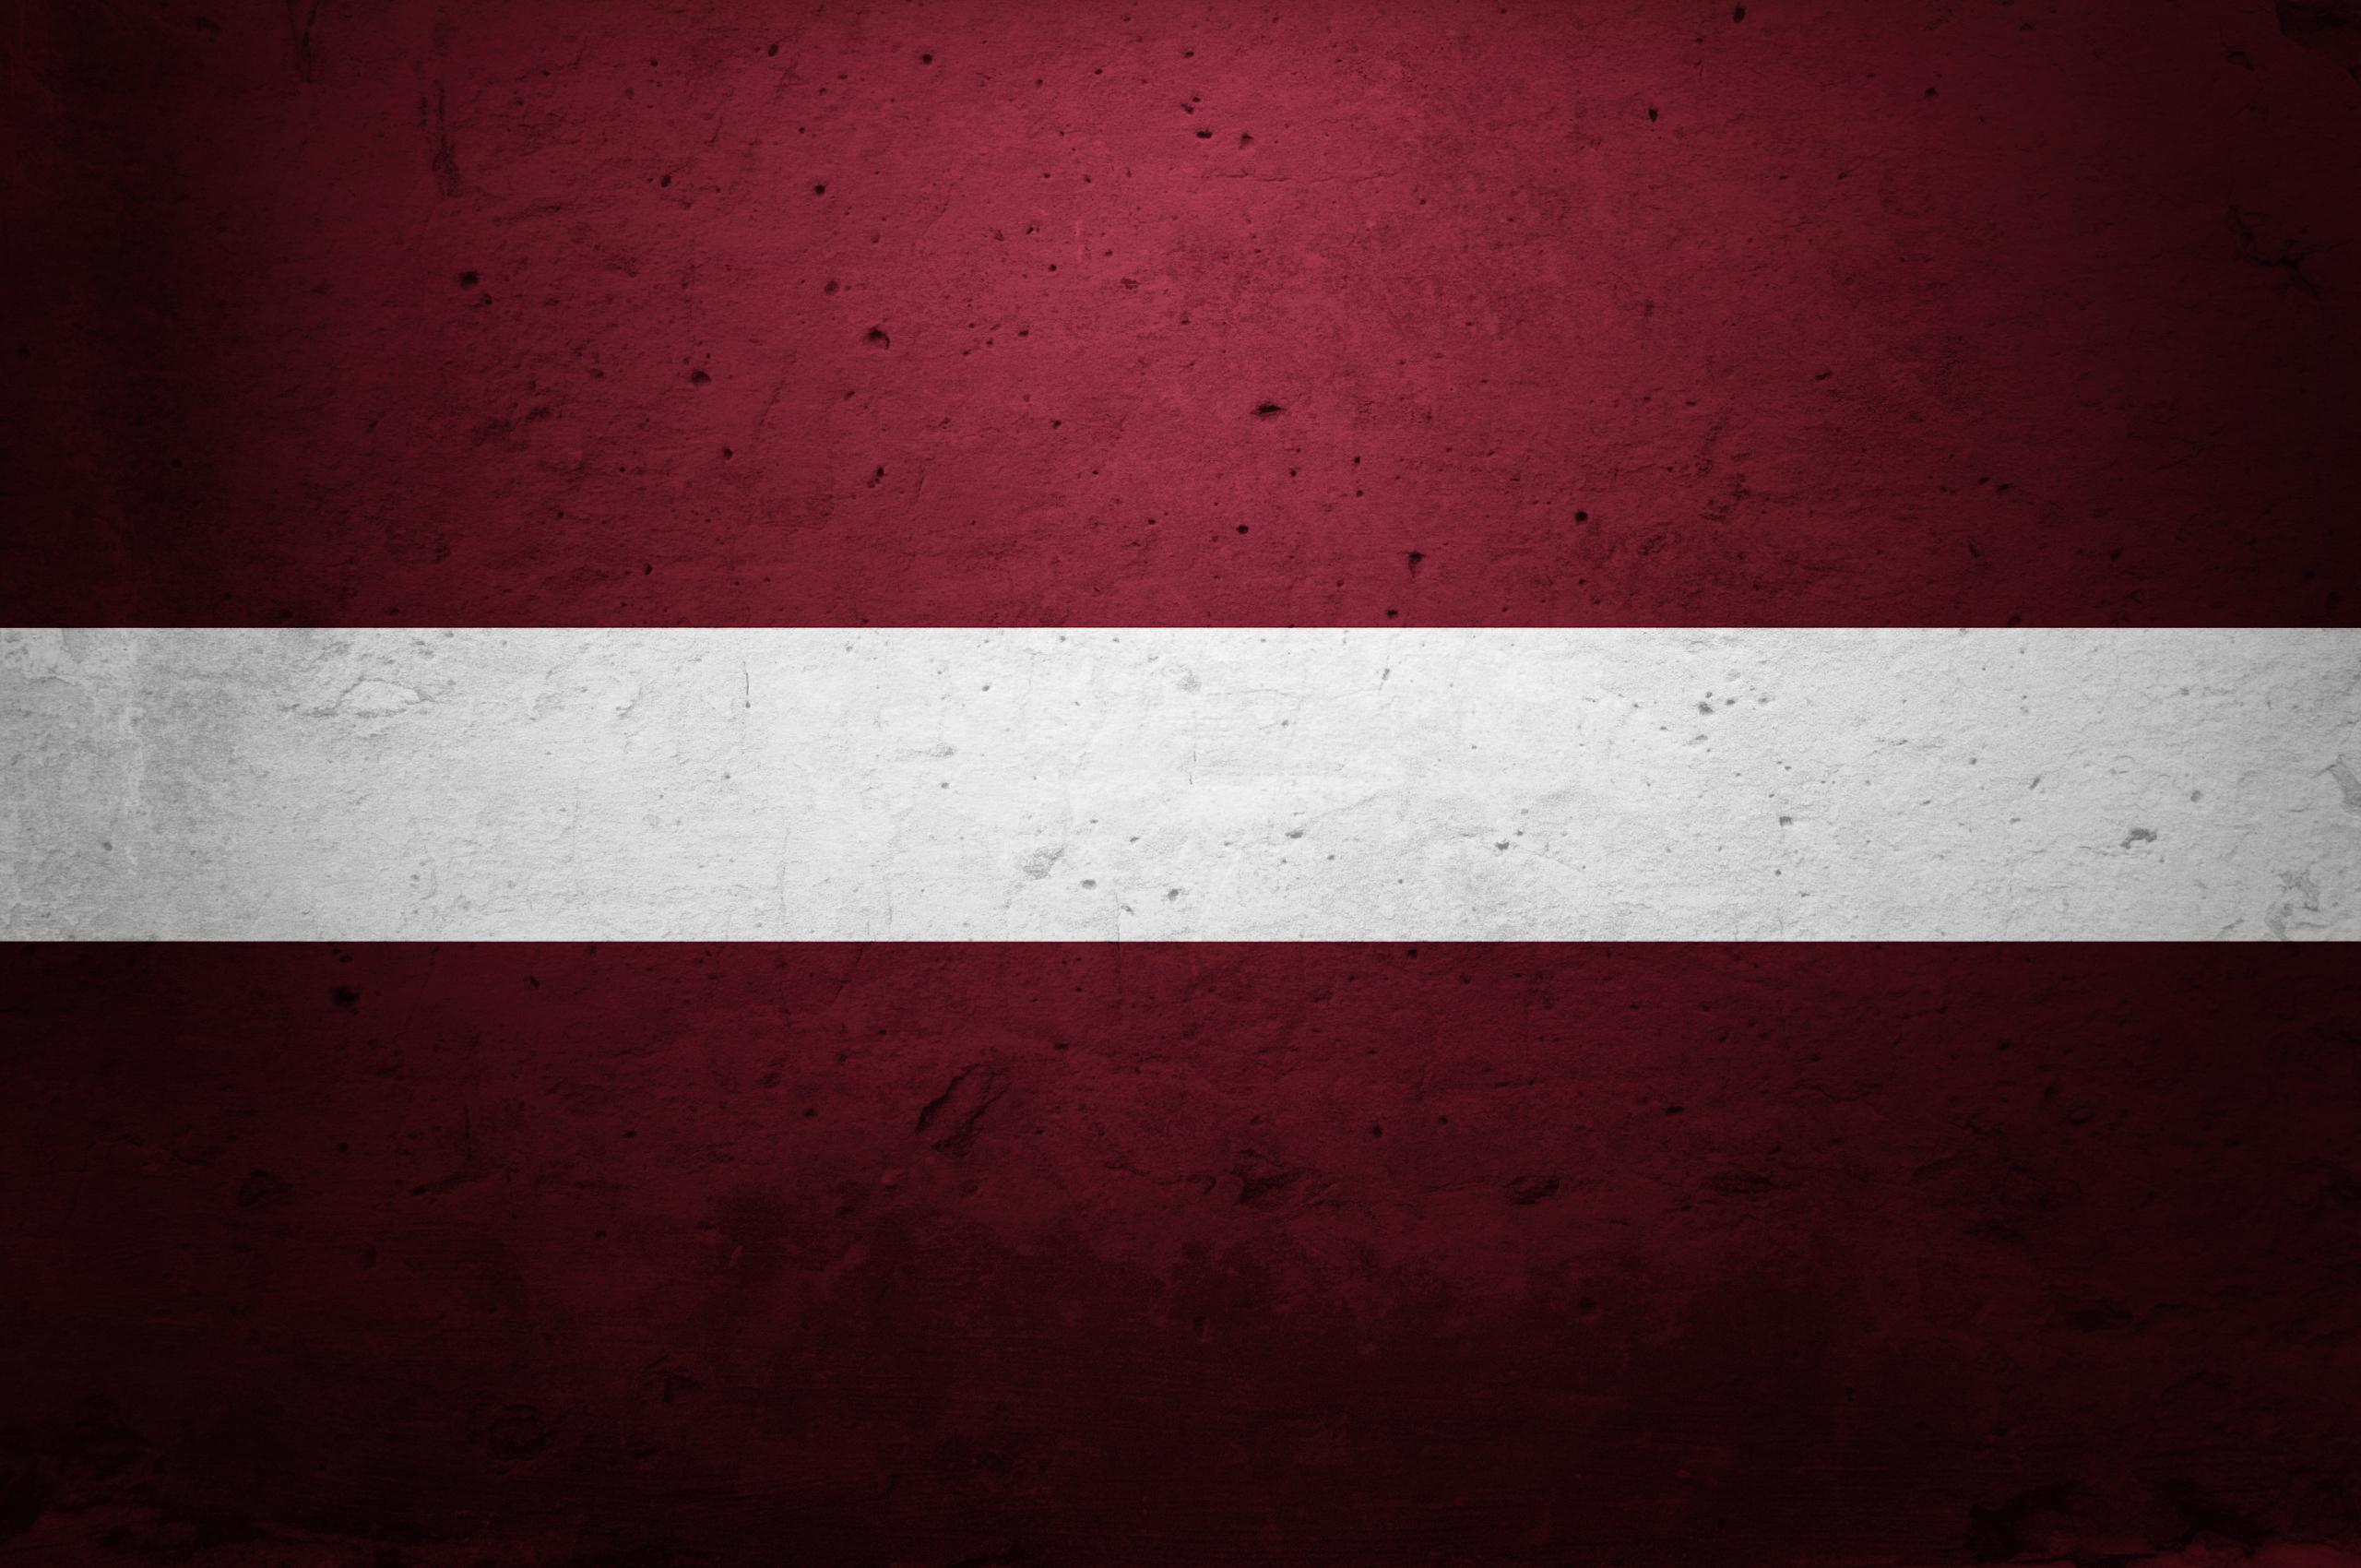 latvia flag wallpaper background 52175